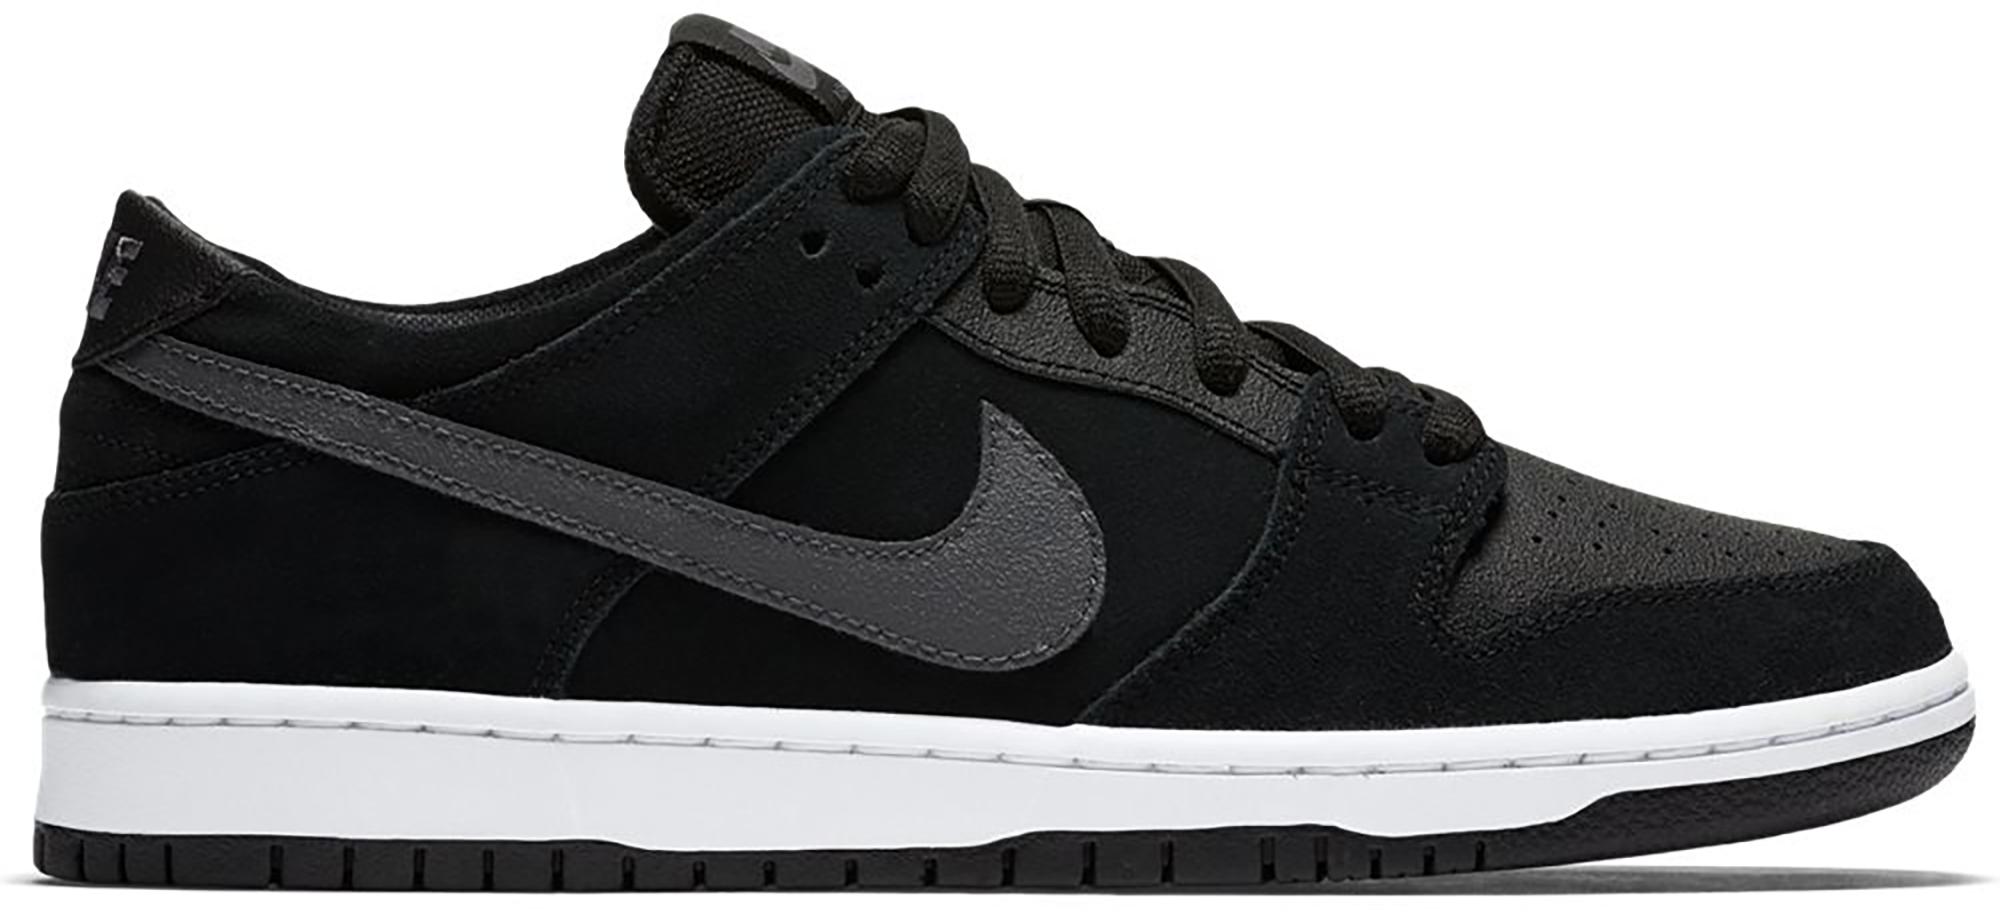 Nike Dunk Low IW Black Light Graphite